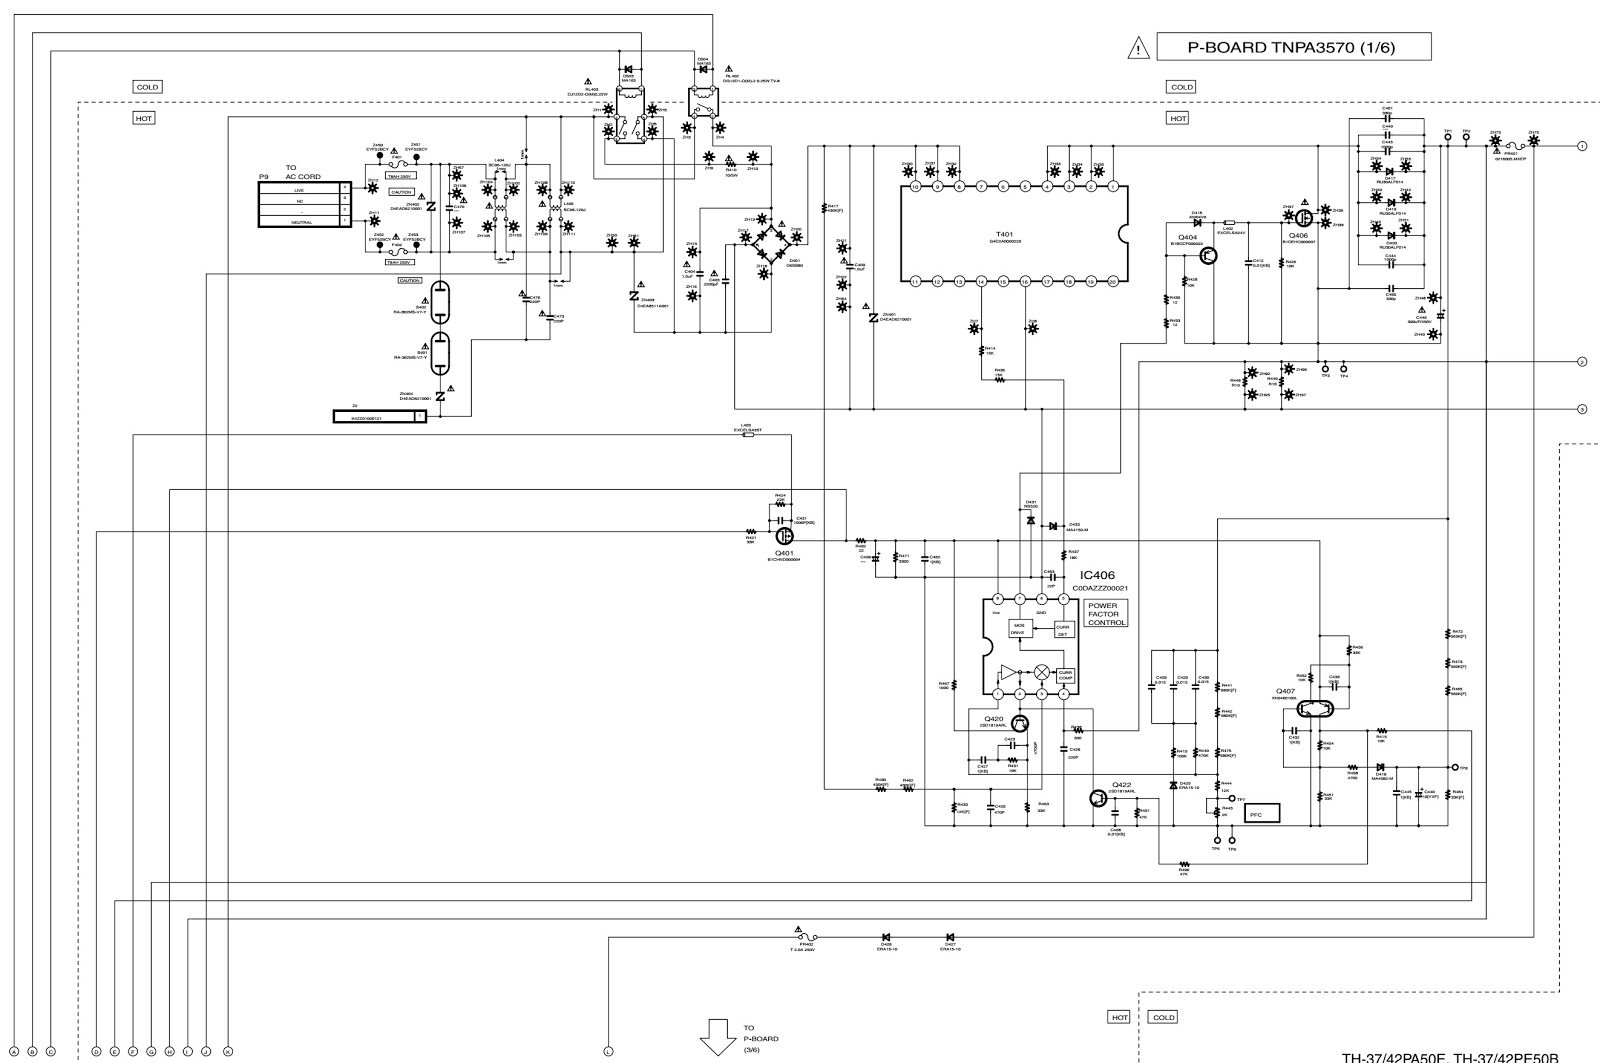 panasonic plasma tv th42 th37 power board schematic panasonic tv parts direct panasonic tv parts direct [ 1600 x 1063 Pixel ]